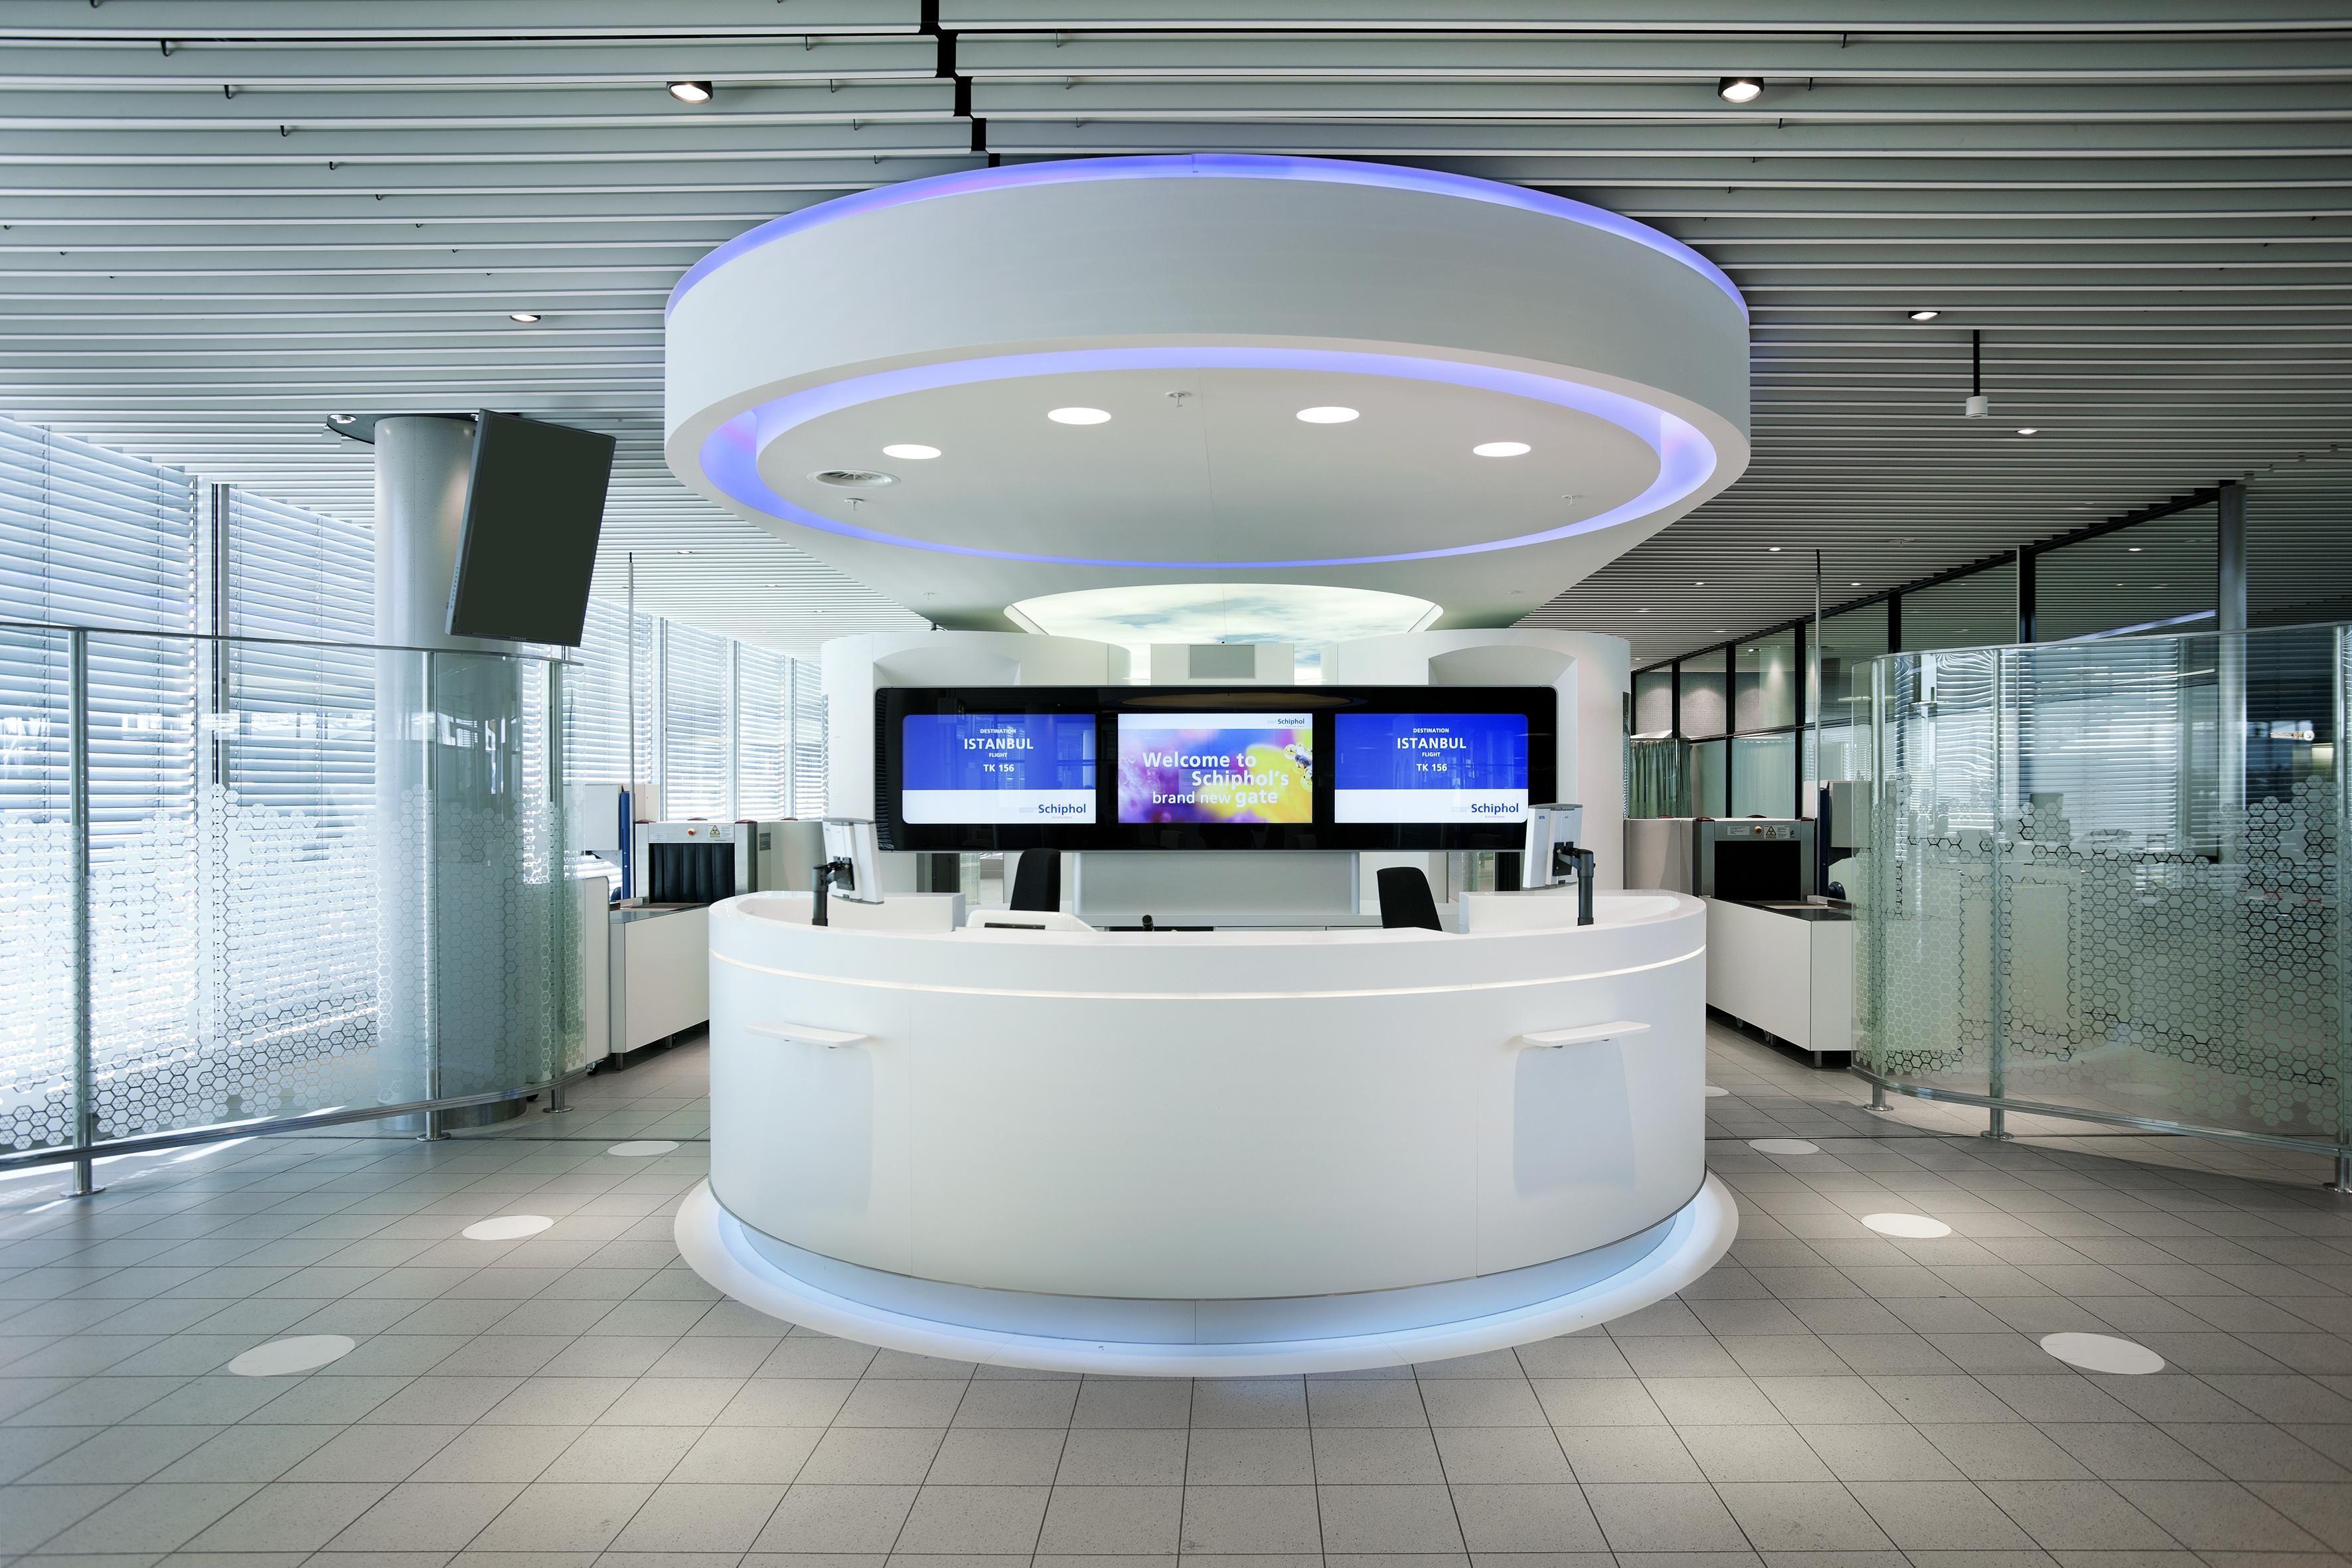 Beautiful Futuristic Interior Design With Circle Set Of